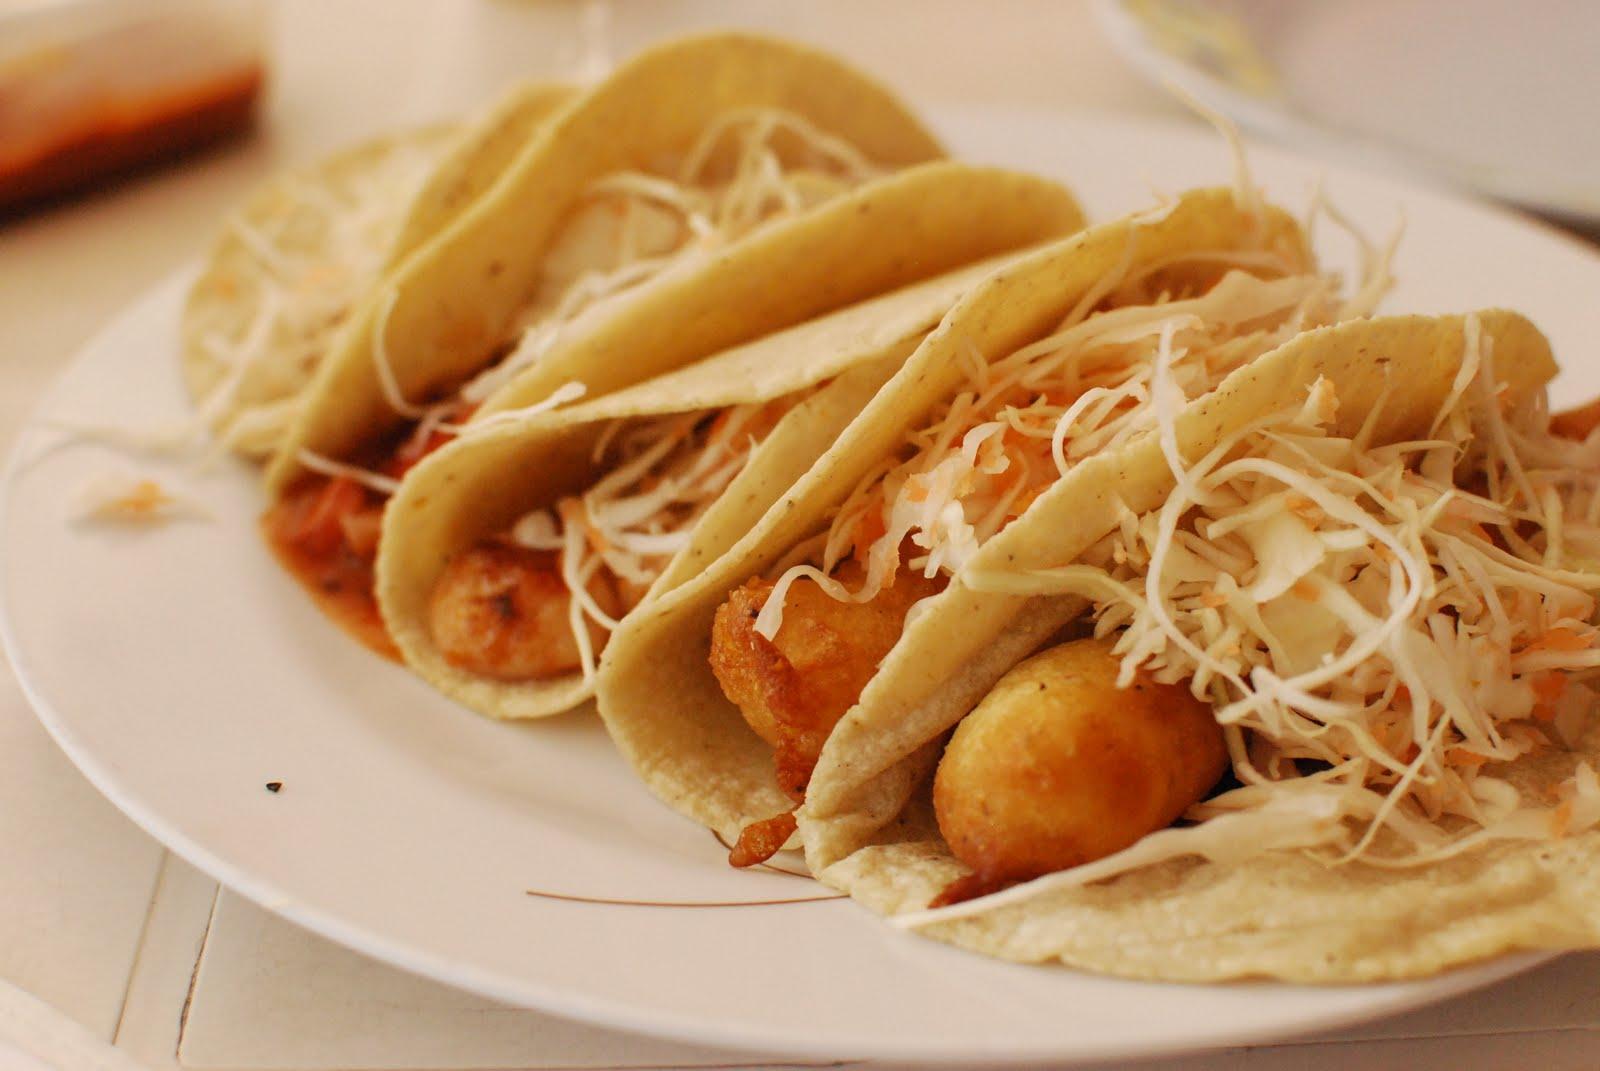 Eat everyday marisma fish tacos in puerto vallarta for Eating fish everyday